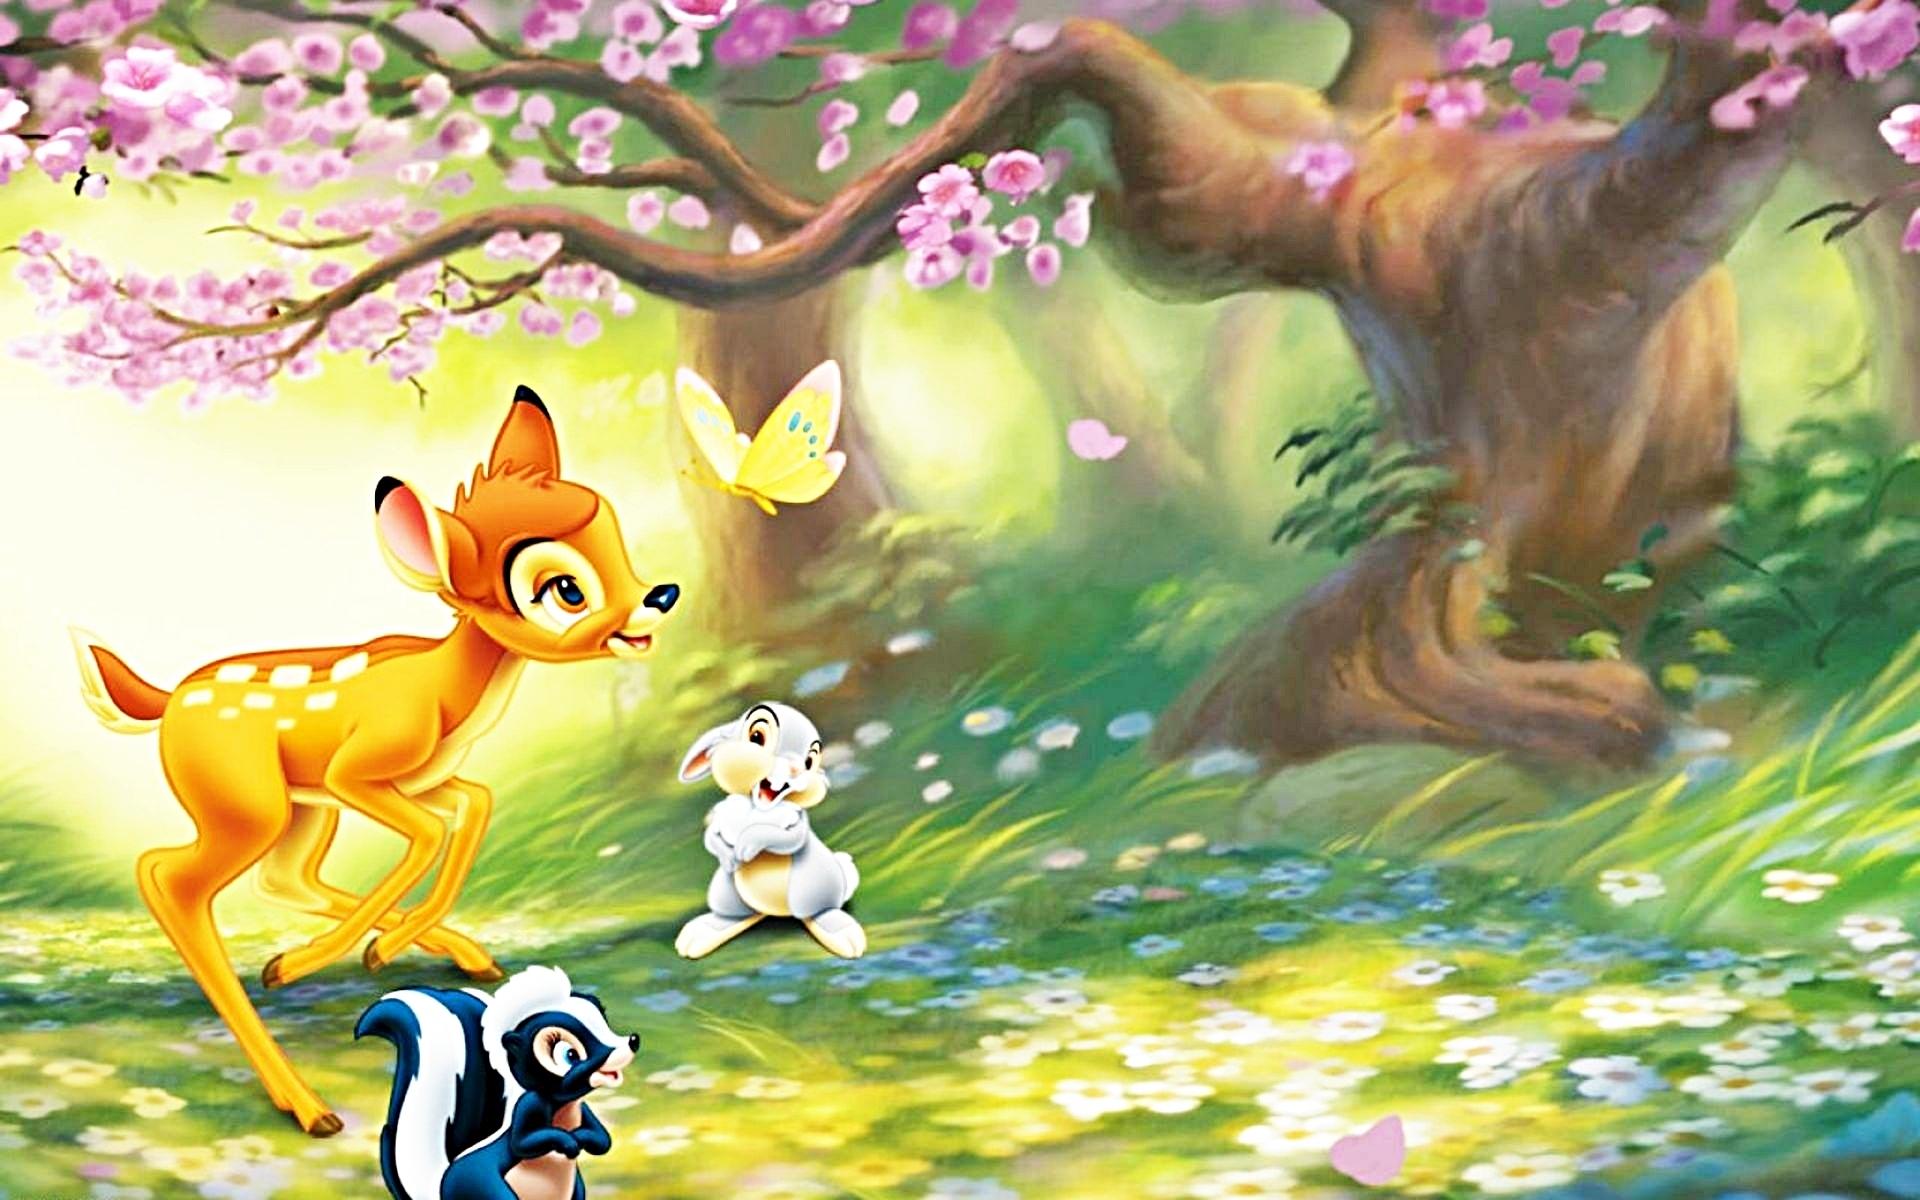 In summer hd wallpaper download cartoon wallpaper html code - Walt Disney S Bambi Wallpaper Walt Disney Characters